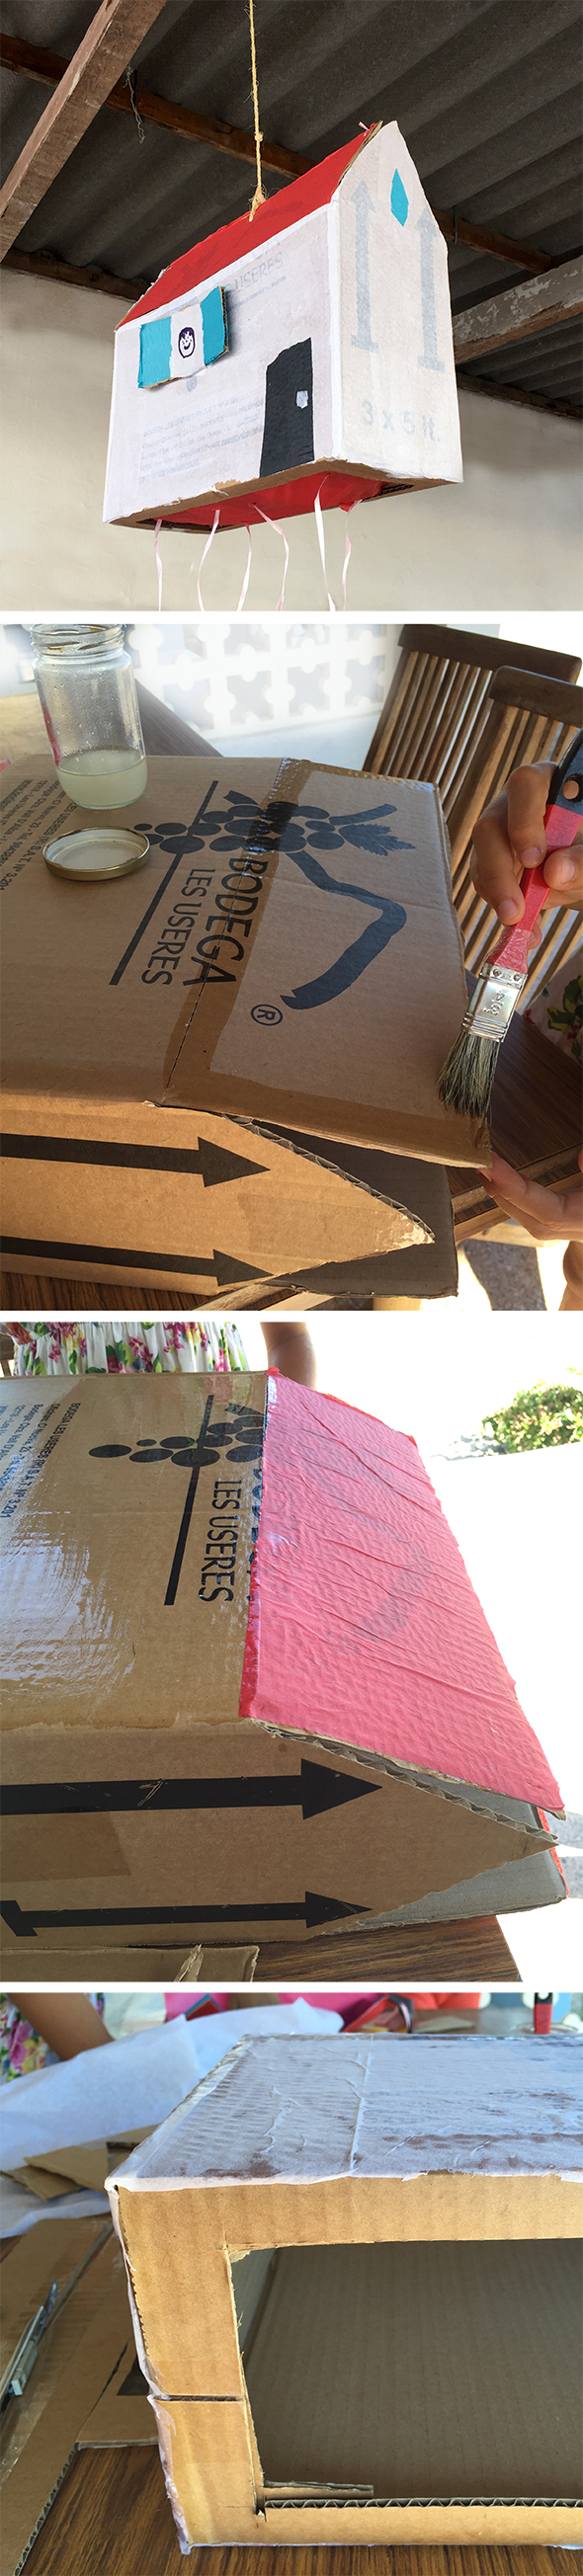 pinata carton cardboard karton cumpleanos facil rapido geburtstag birthday spiel game